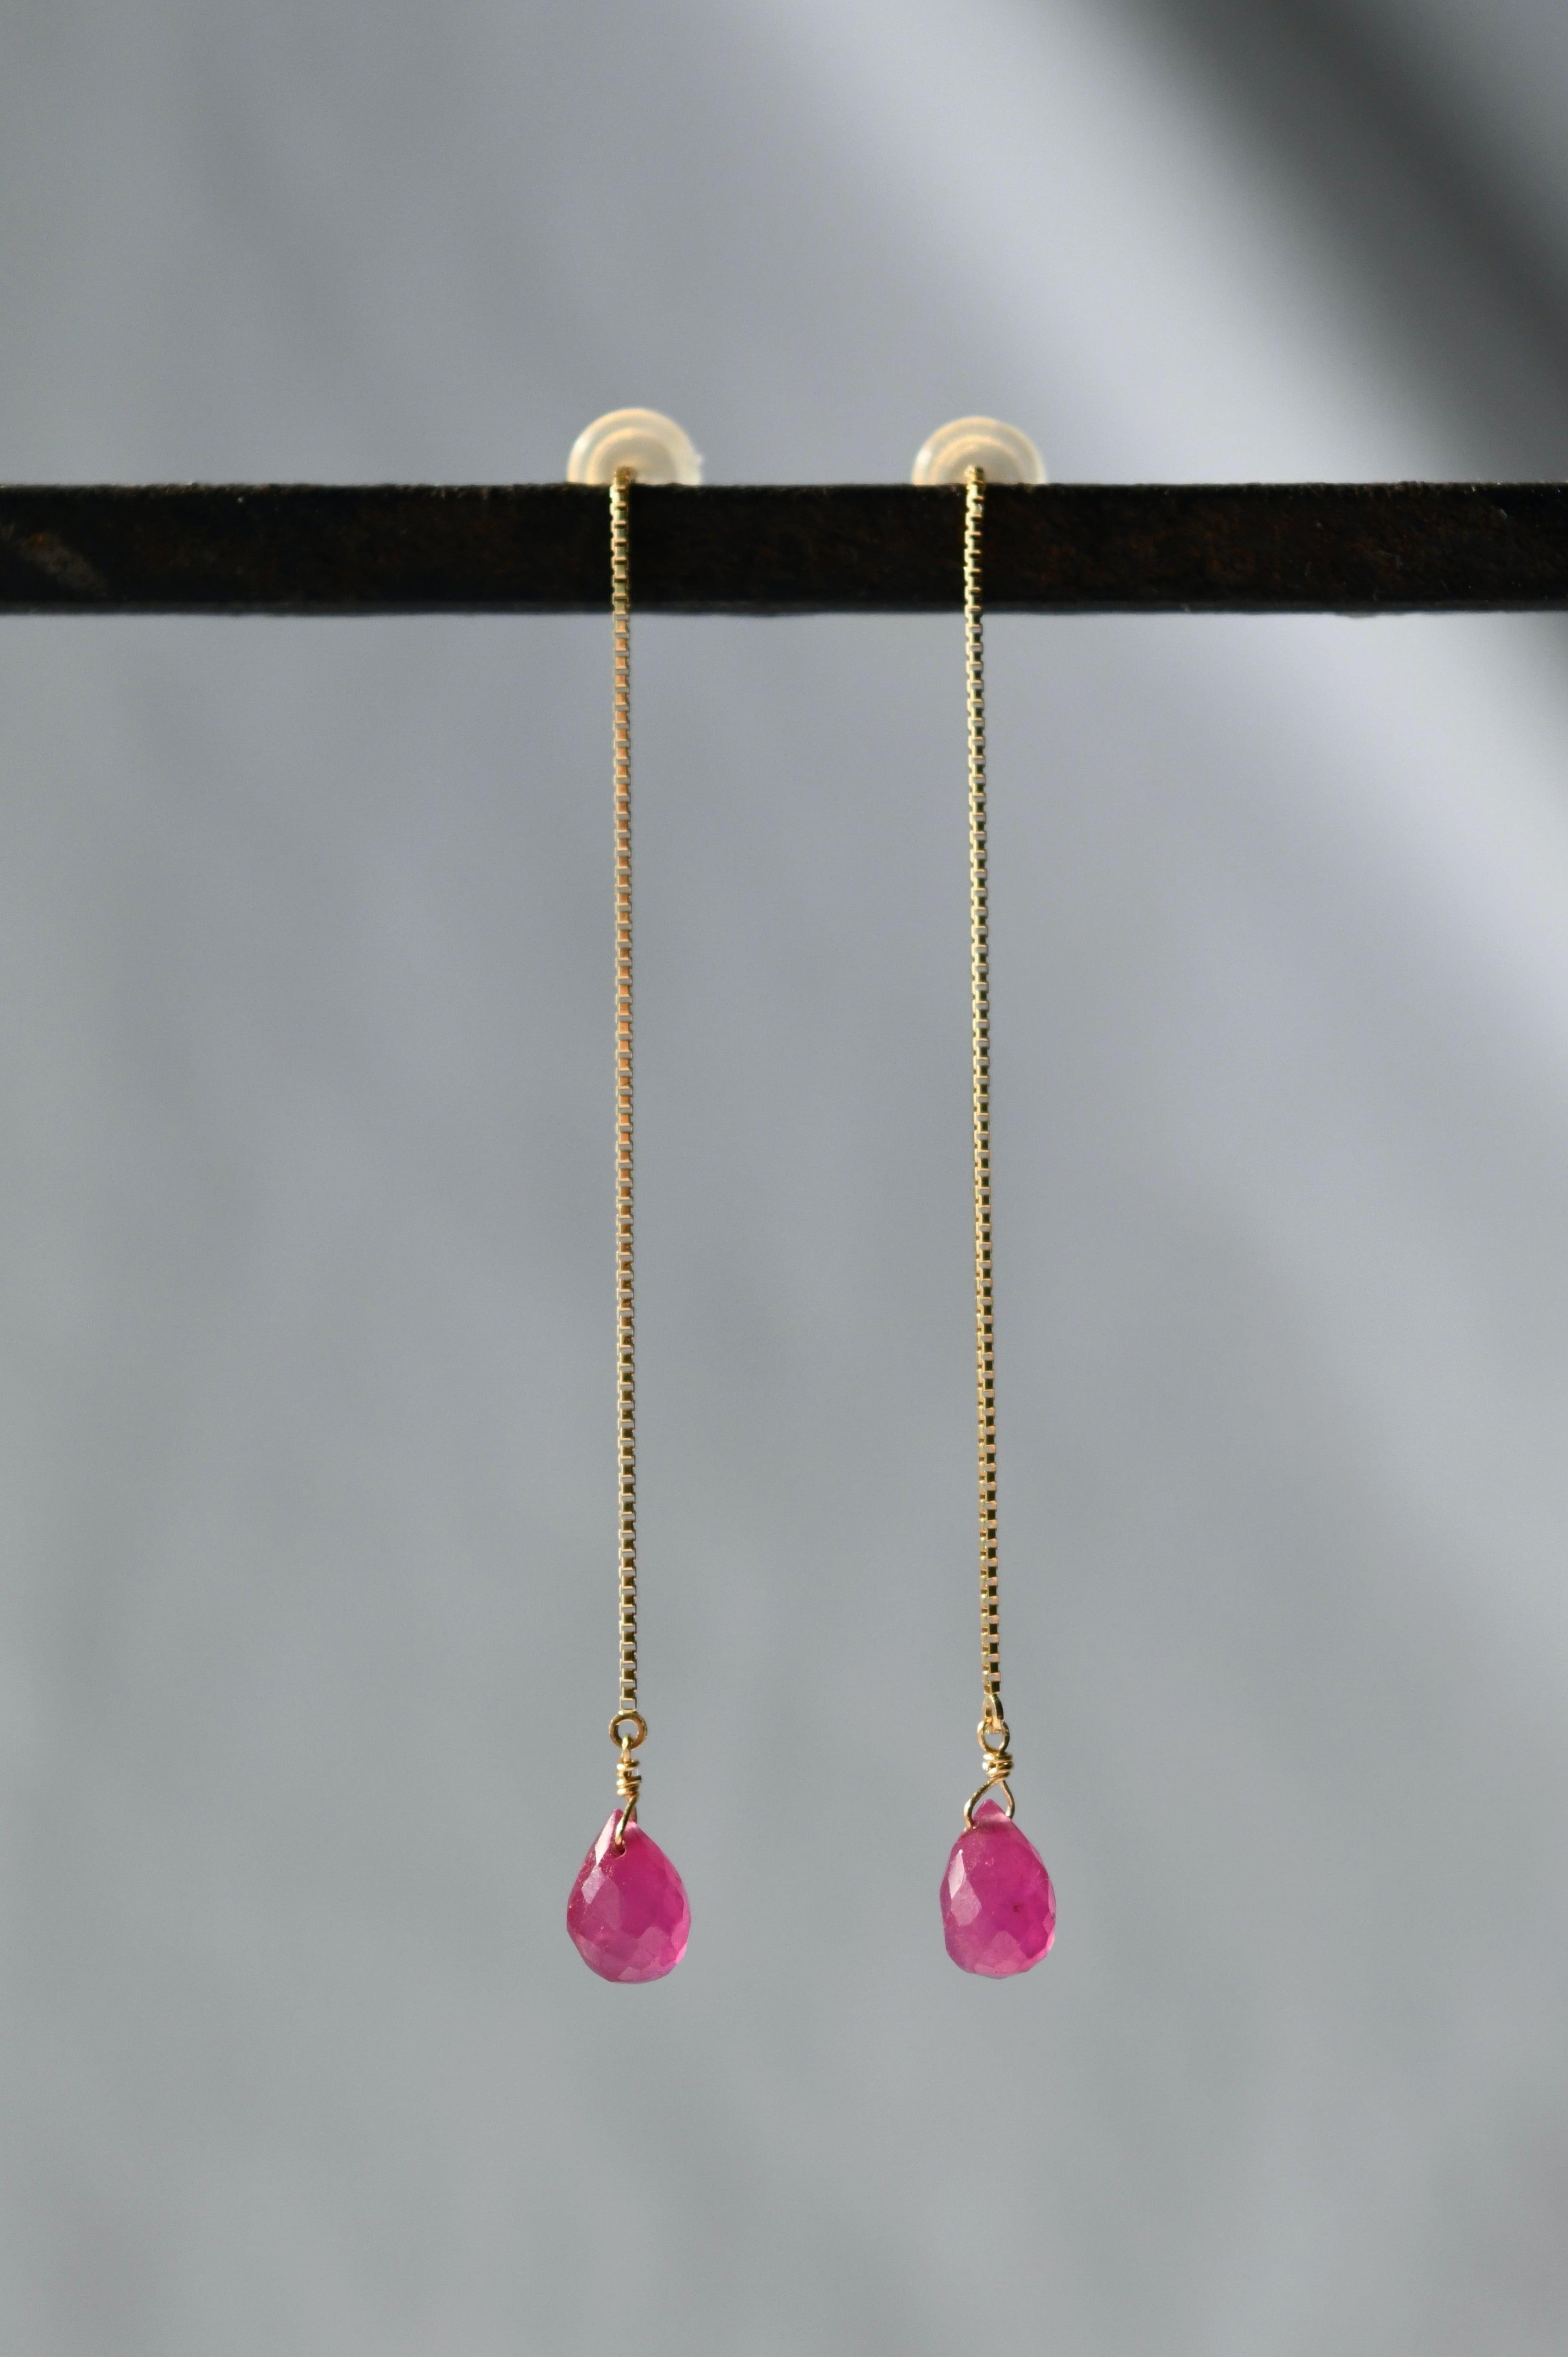 K18 Ruby Long Chain Earrings 18金ルビーロングチェーンピアス